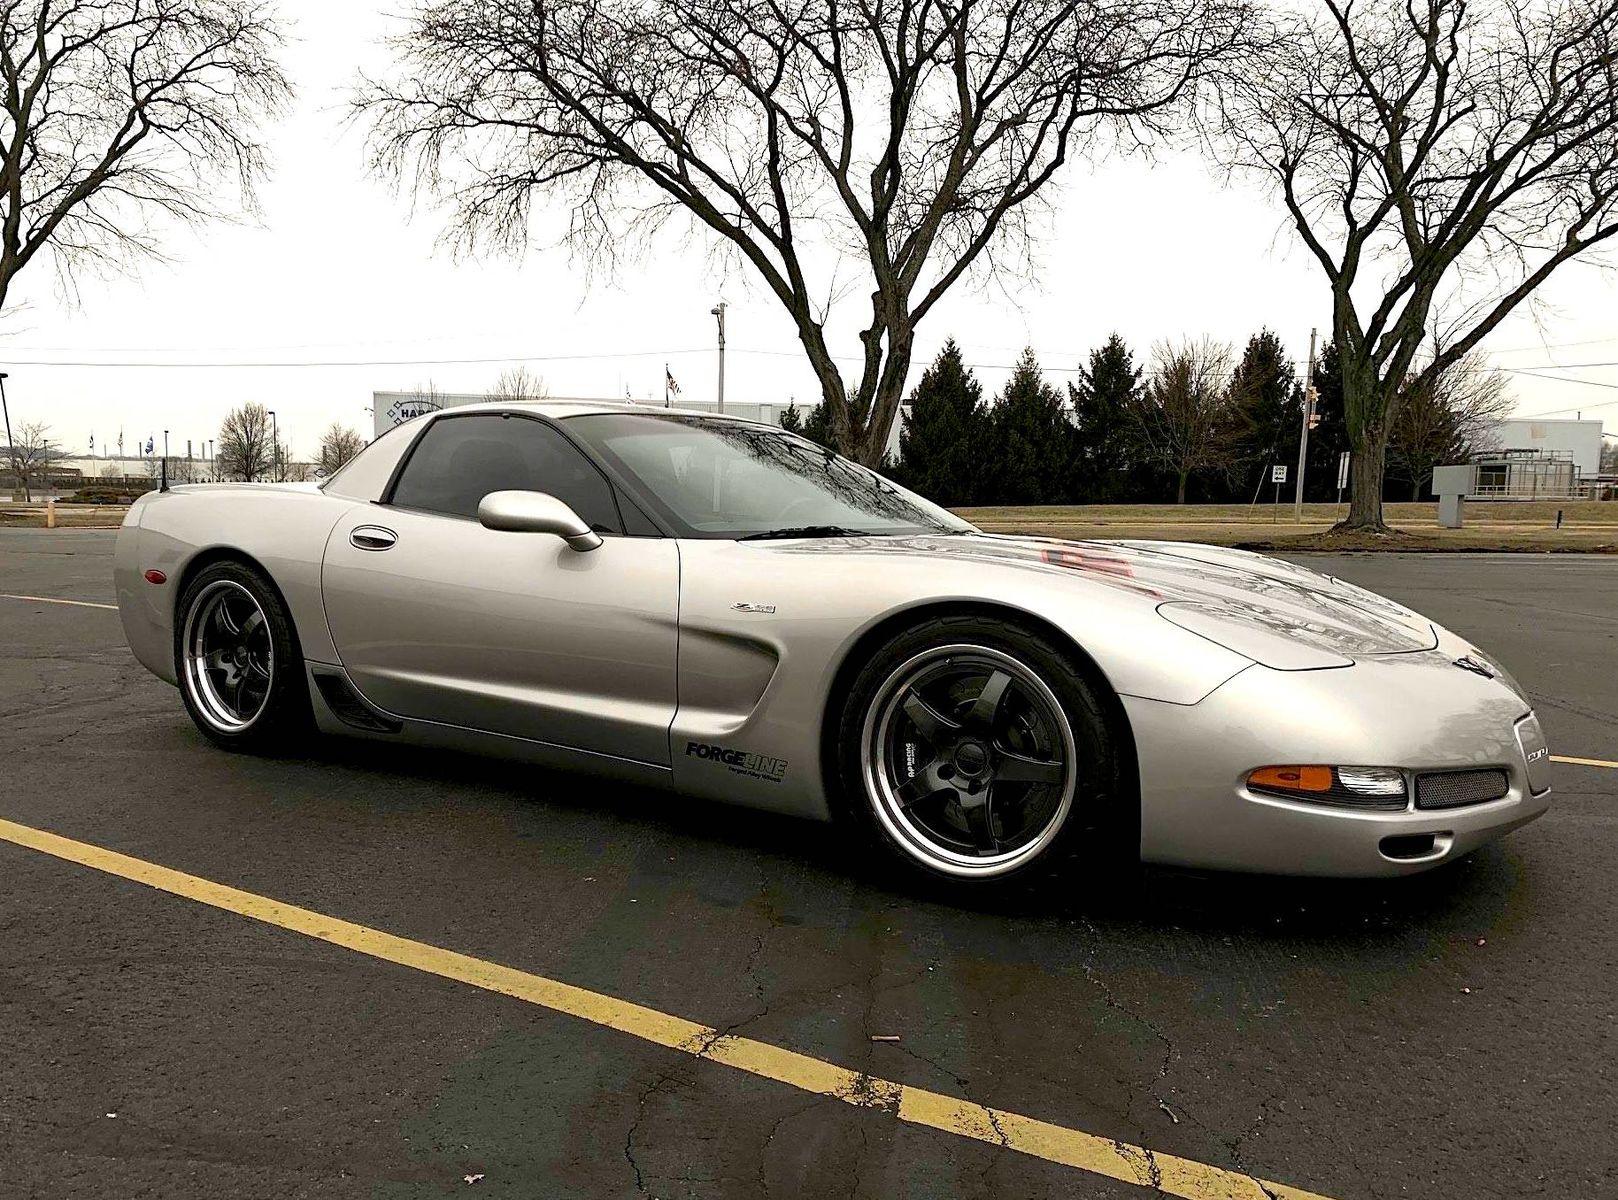 2004 Chevrolet Corvette Z06   Dave Schardt's 487whp C5 Corvette Z06 on Forgeline GF3 Wheels